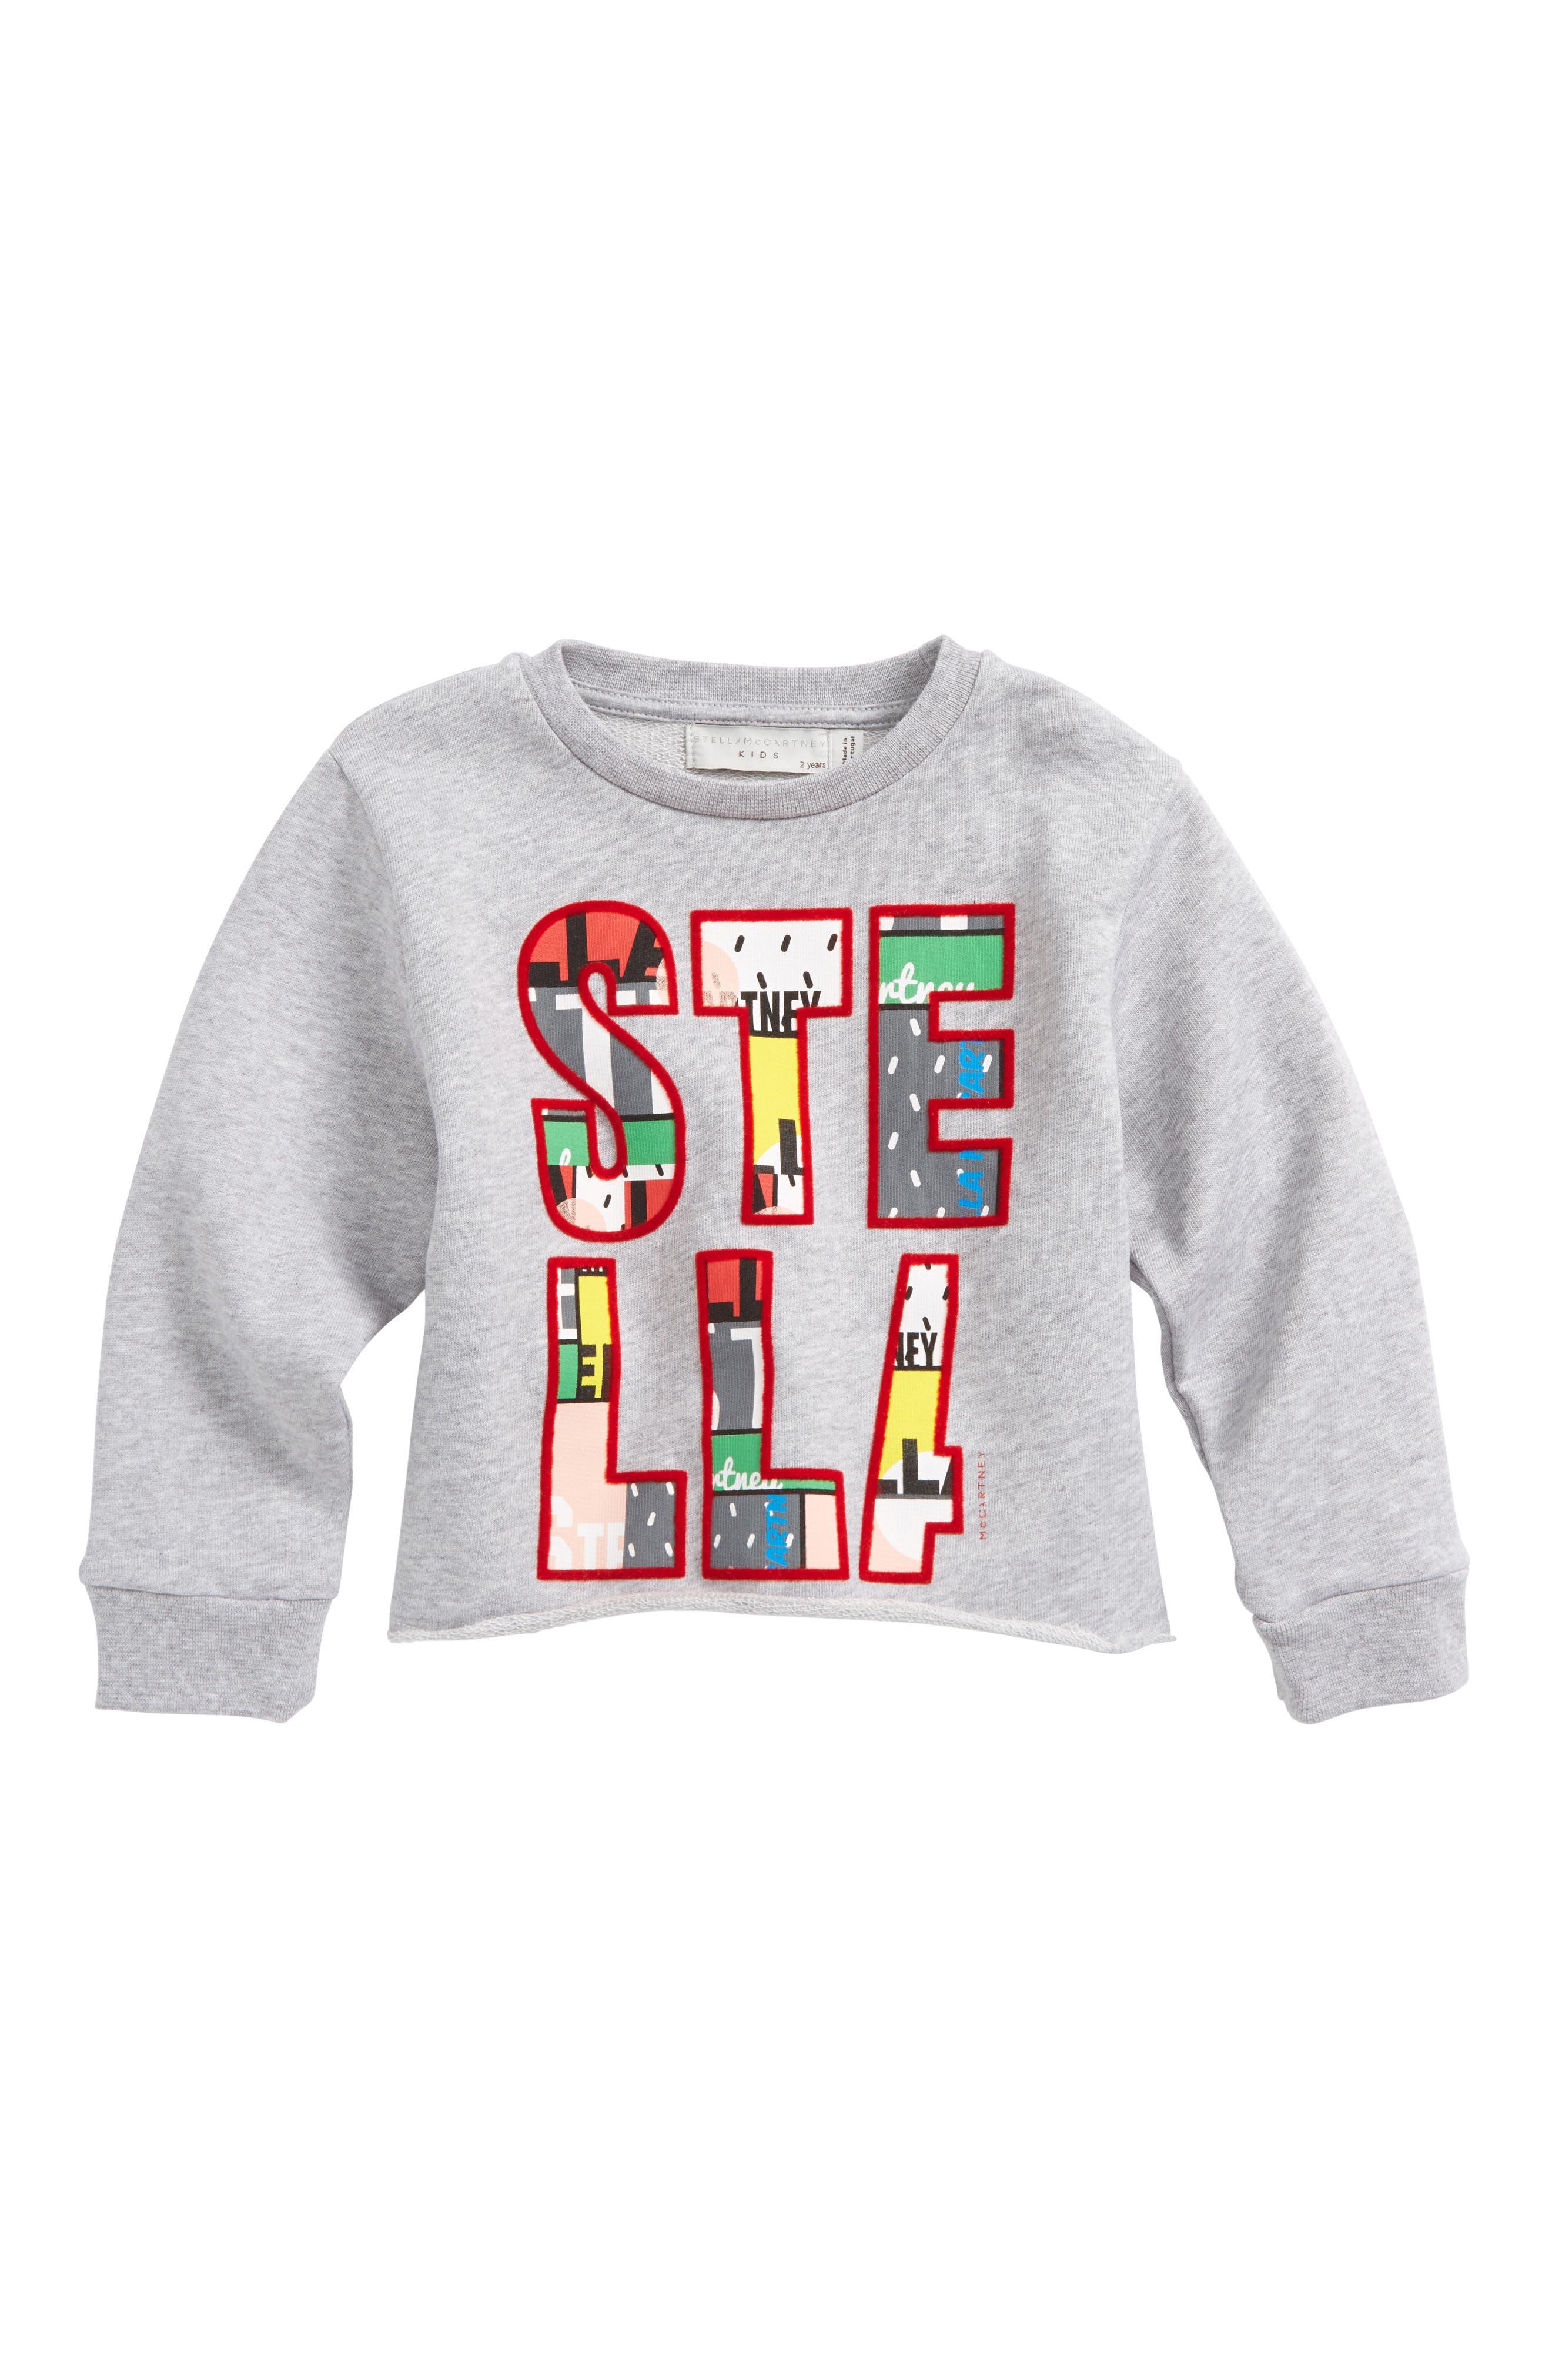 STELLA MCCARTNEY June Crop Sweatshirt, Main, color, 021